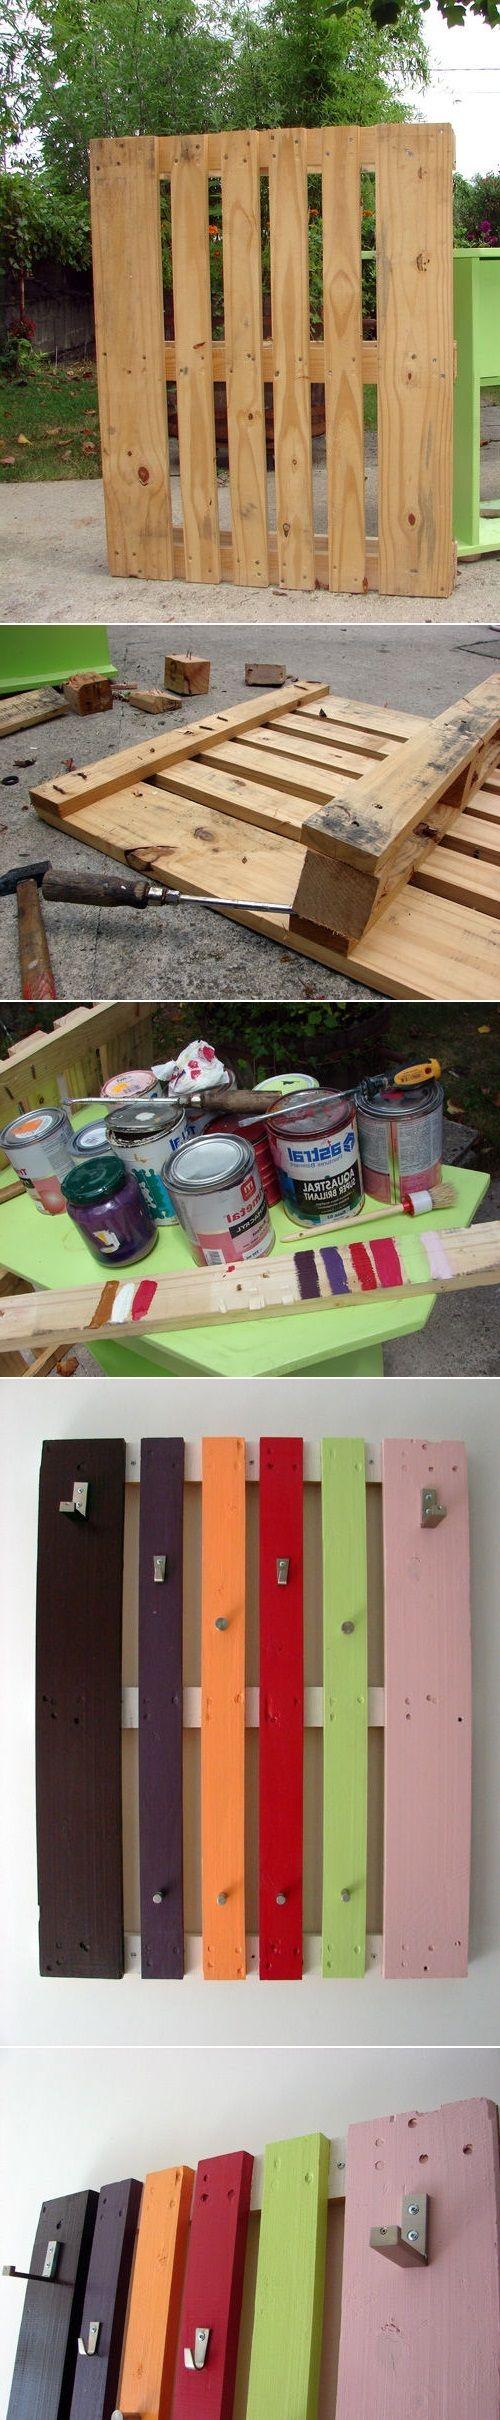 Kolorowy wieszak na ubrania z palet/ DIY Coat Rack From A Wood Pallet